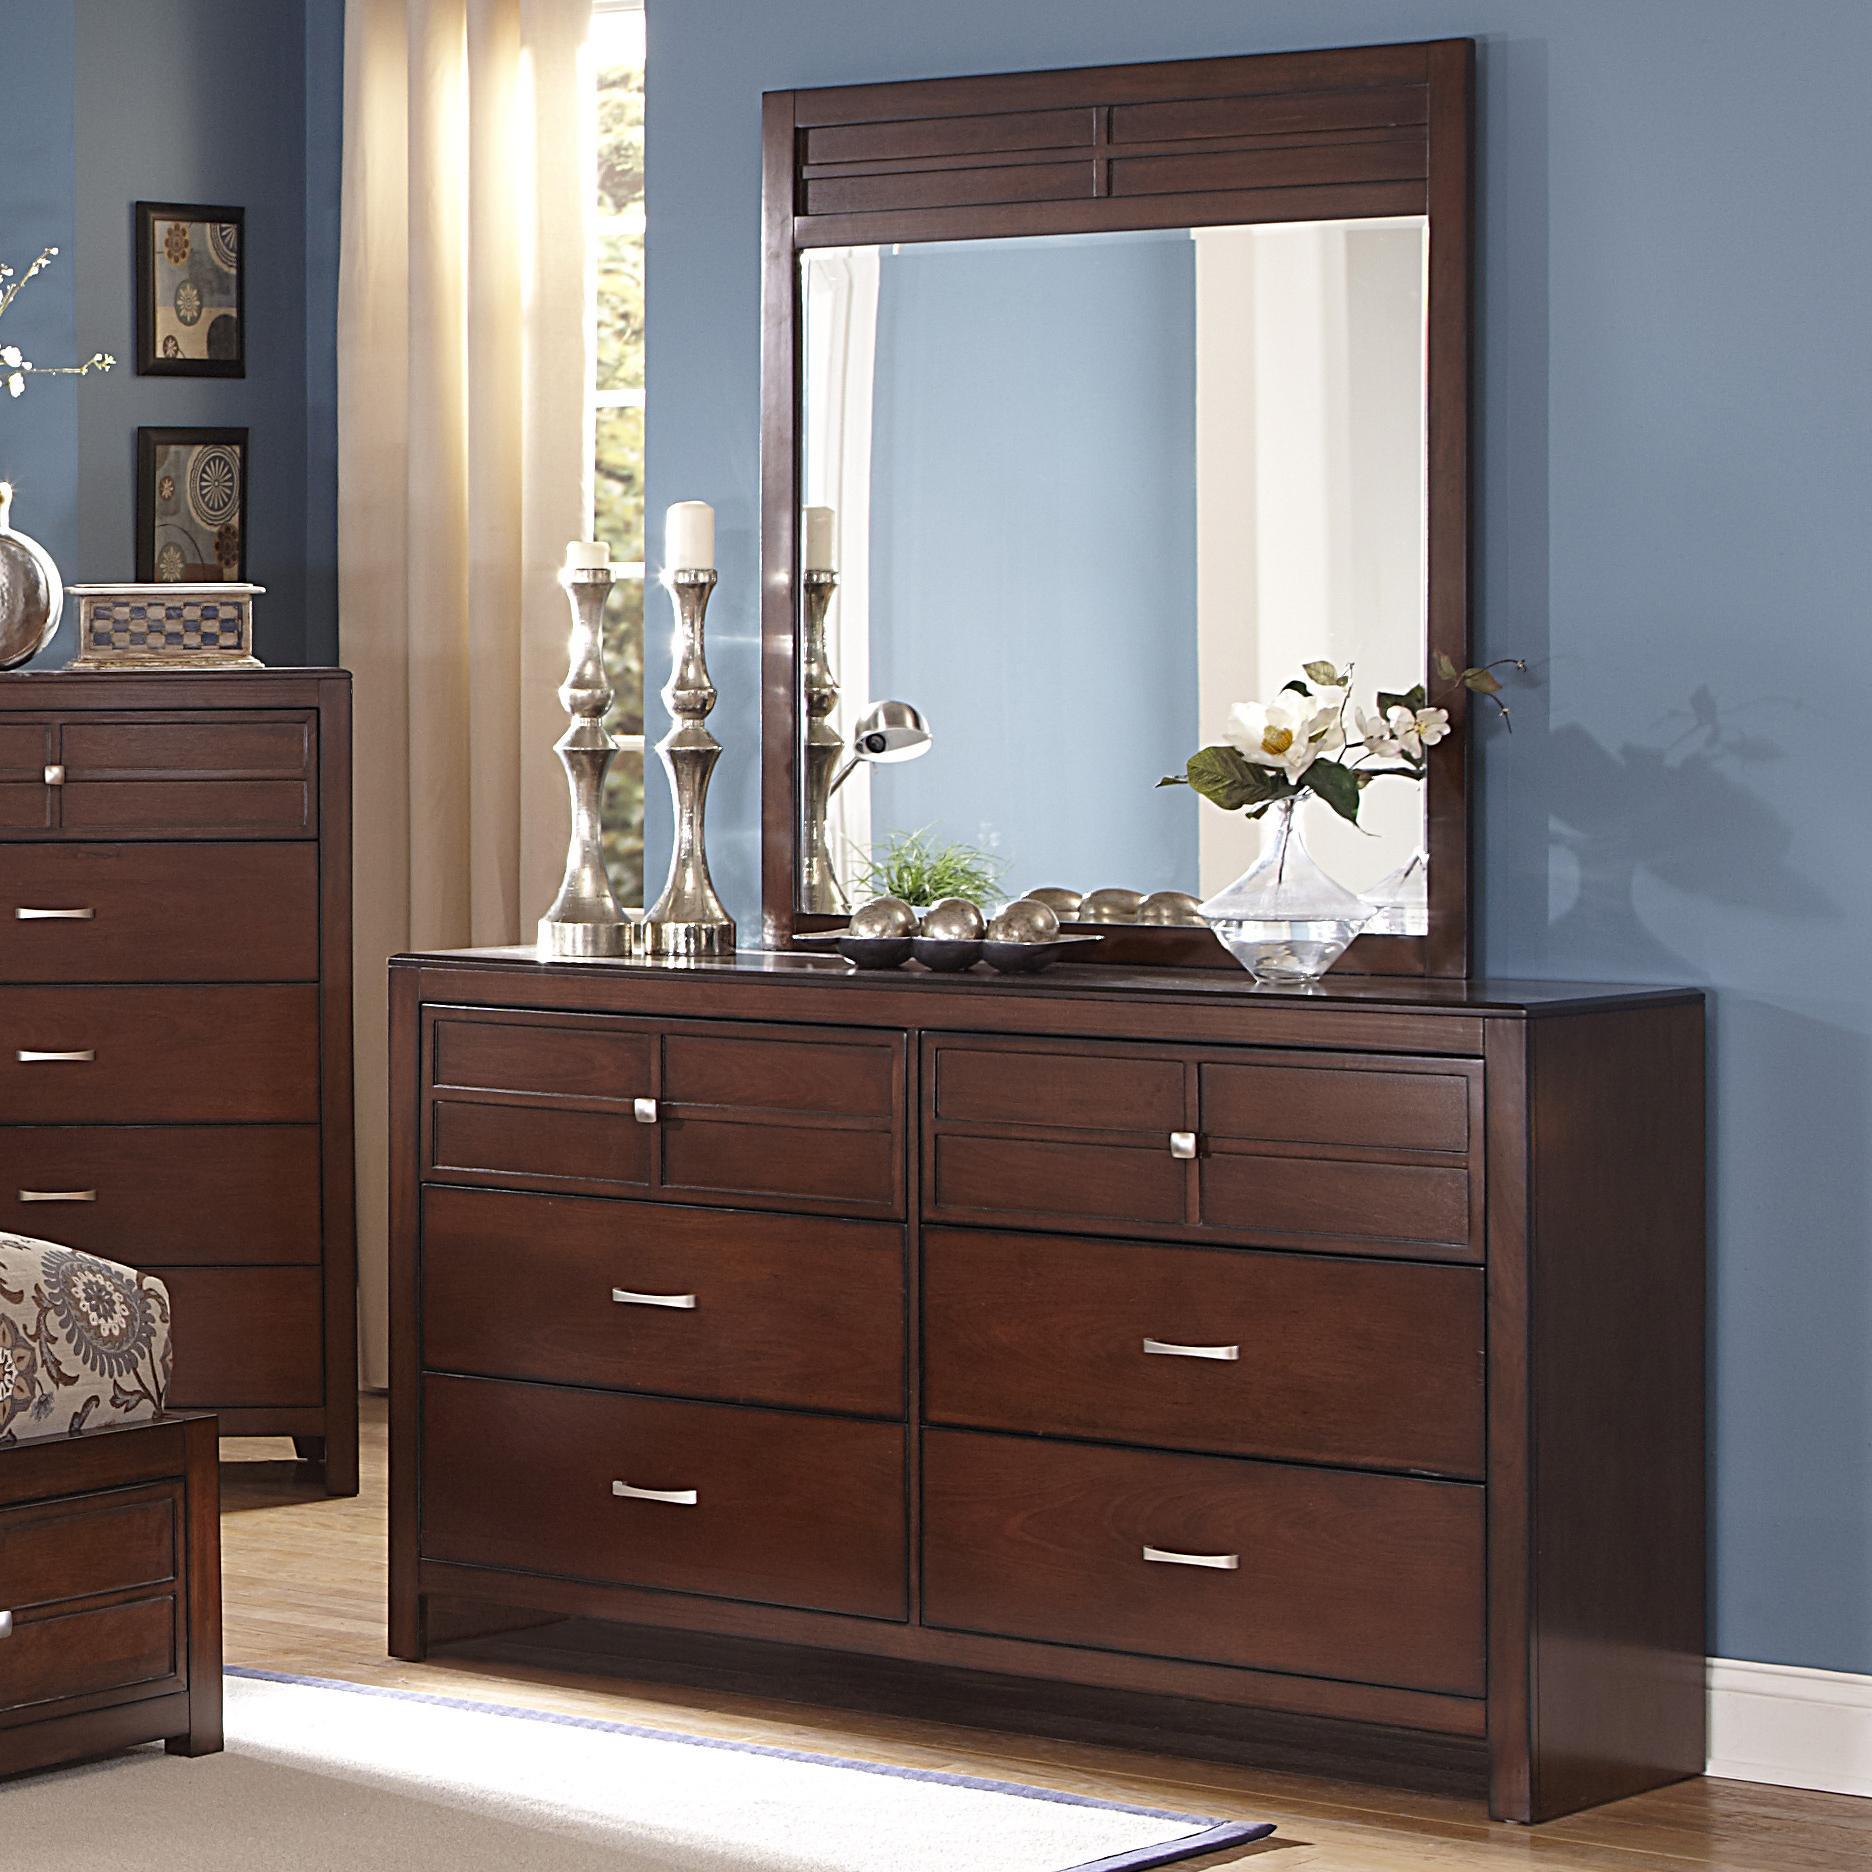 New Classic Kensington 6Drawer Dresser and Vertical Mirror Set  Dunk  Bright Furniture